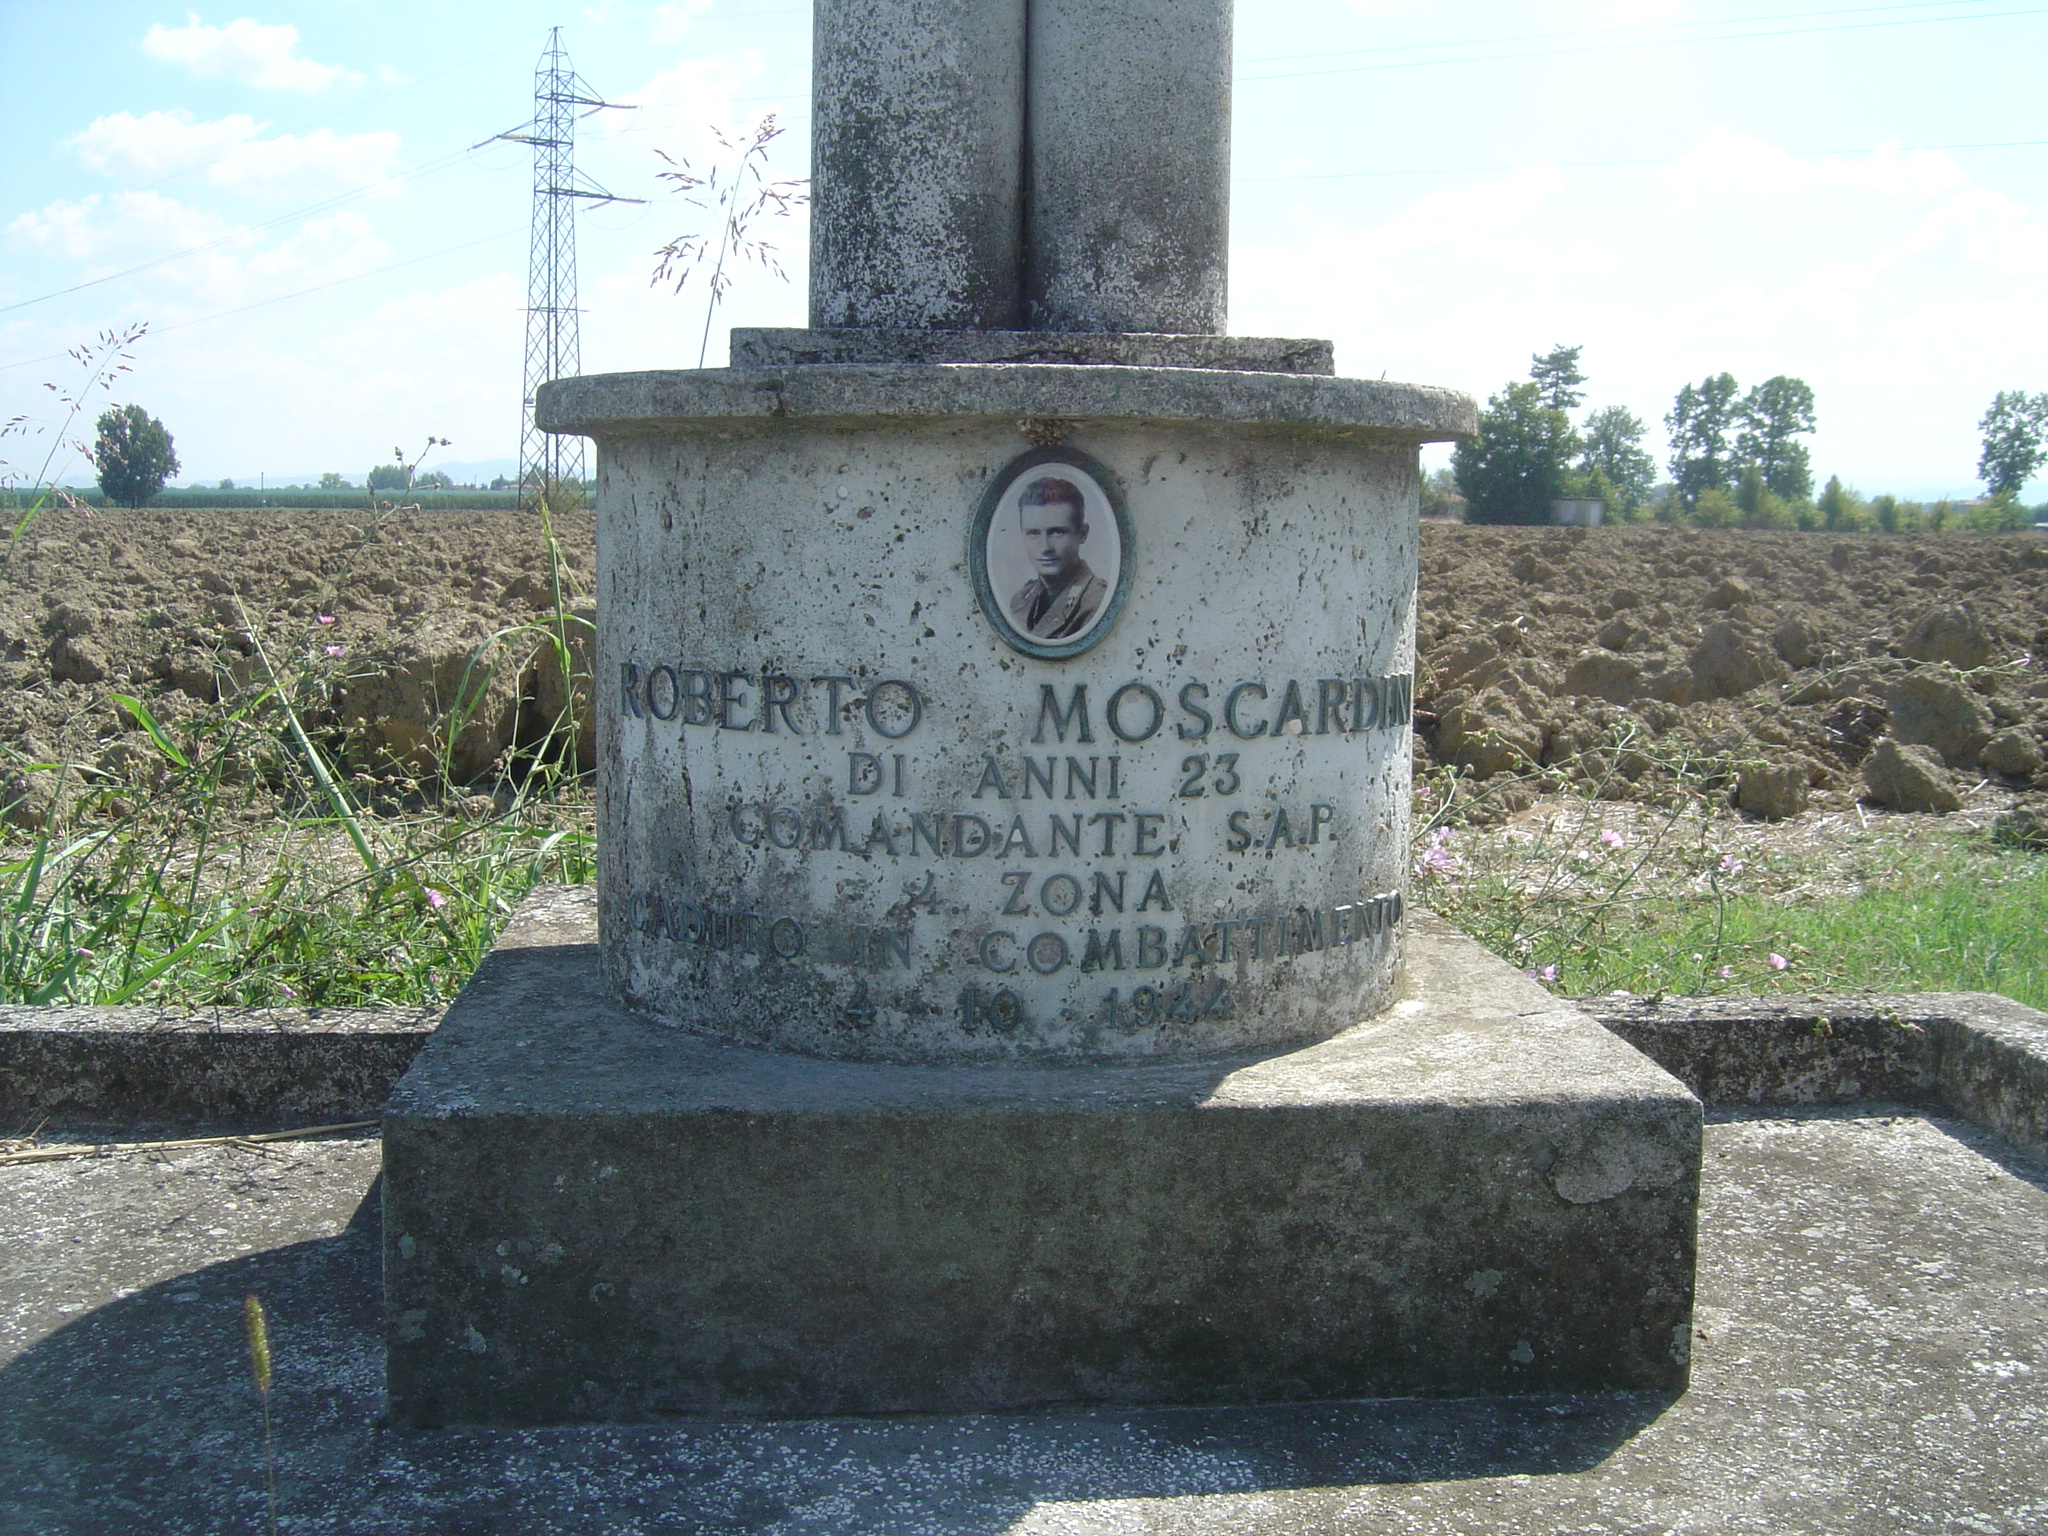 ROBERTO-MOSCARDINI